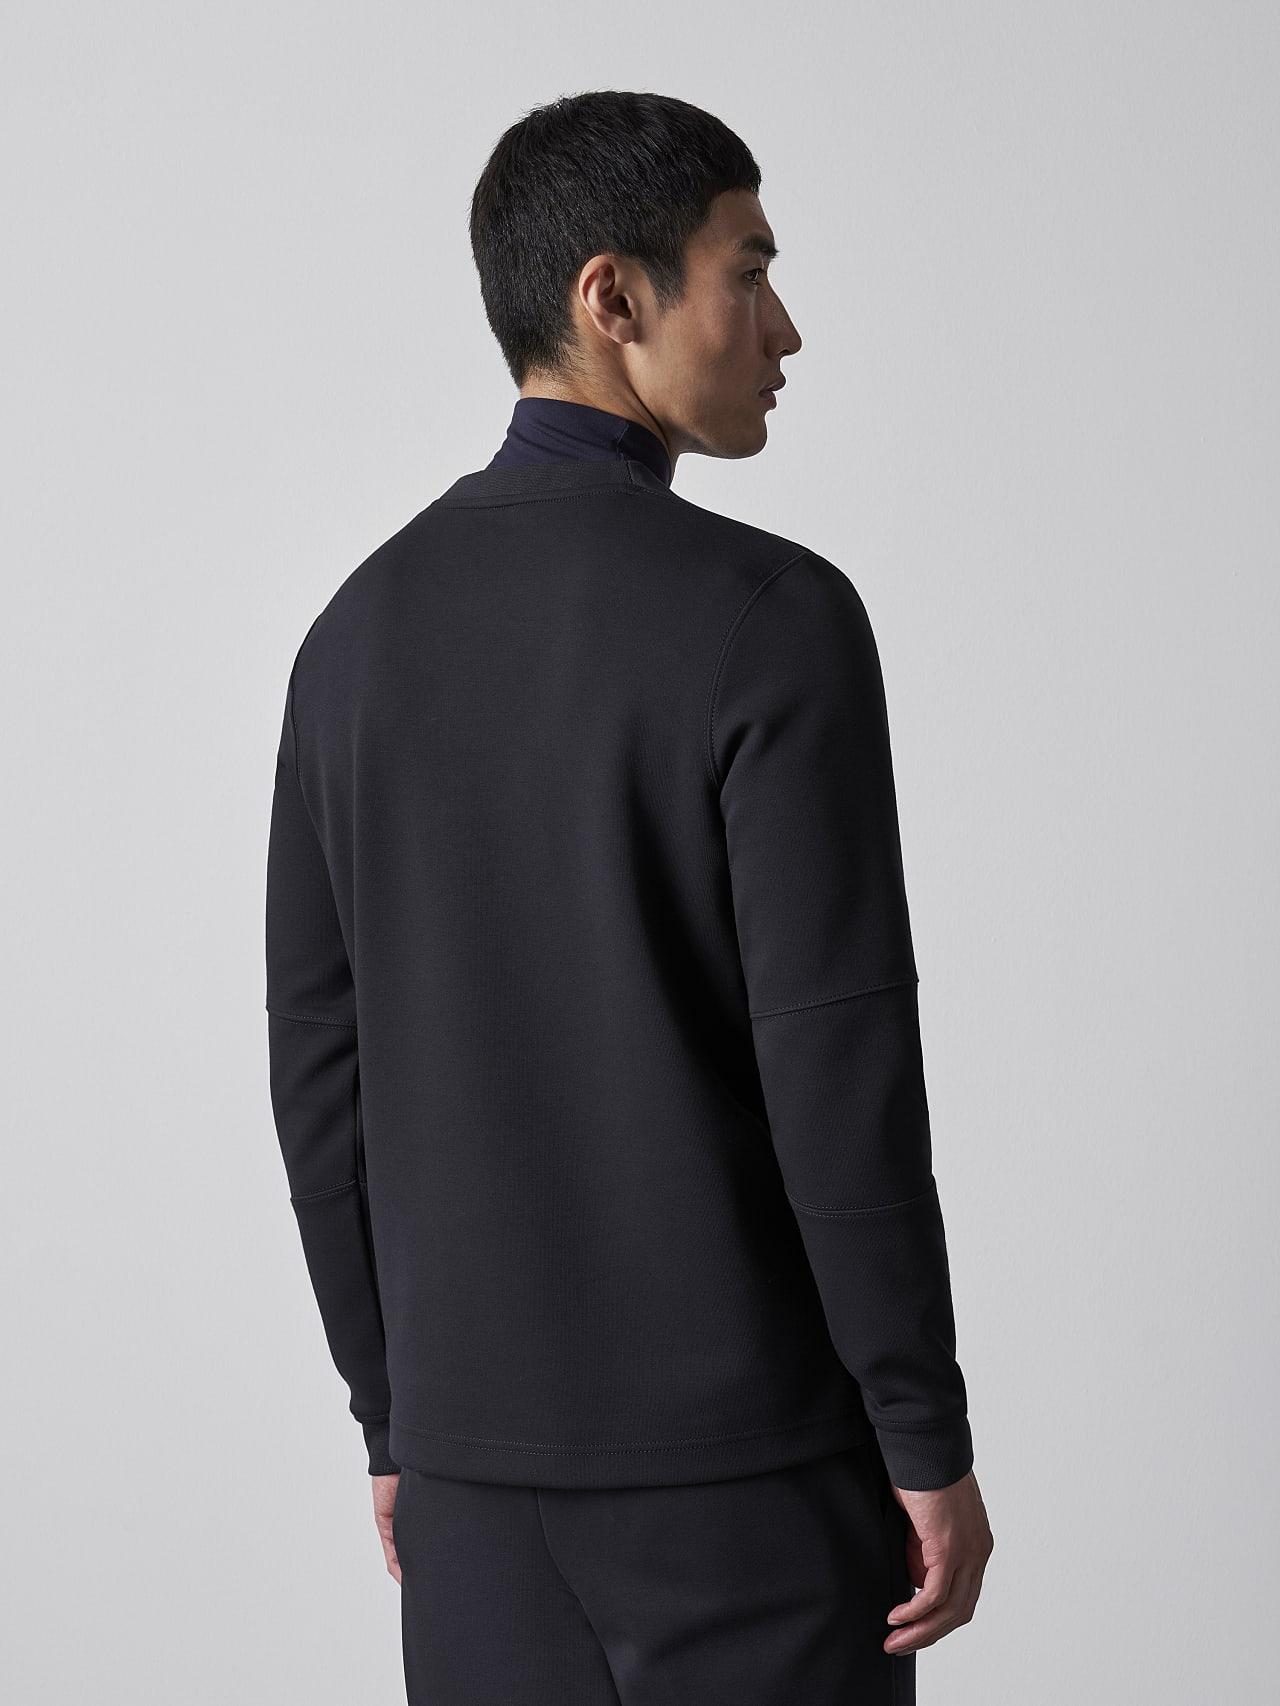 SCONA V1.Y5.02 Premium Sweatshirt black Front Main Alpha Tauri